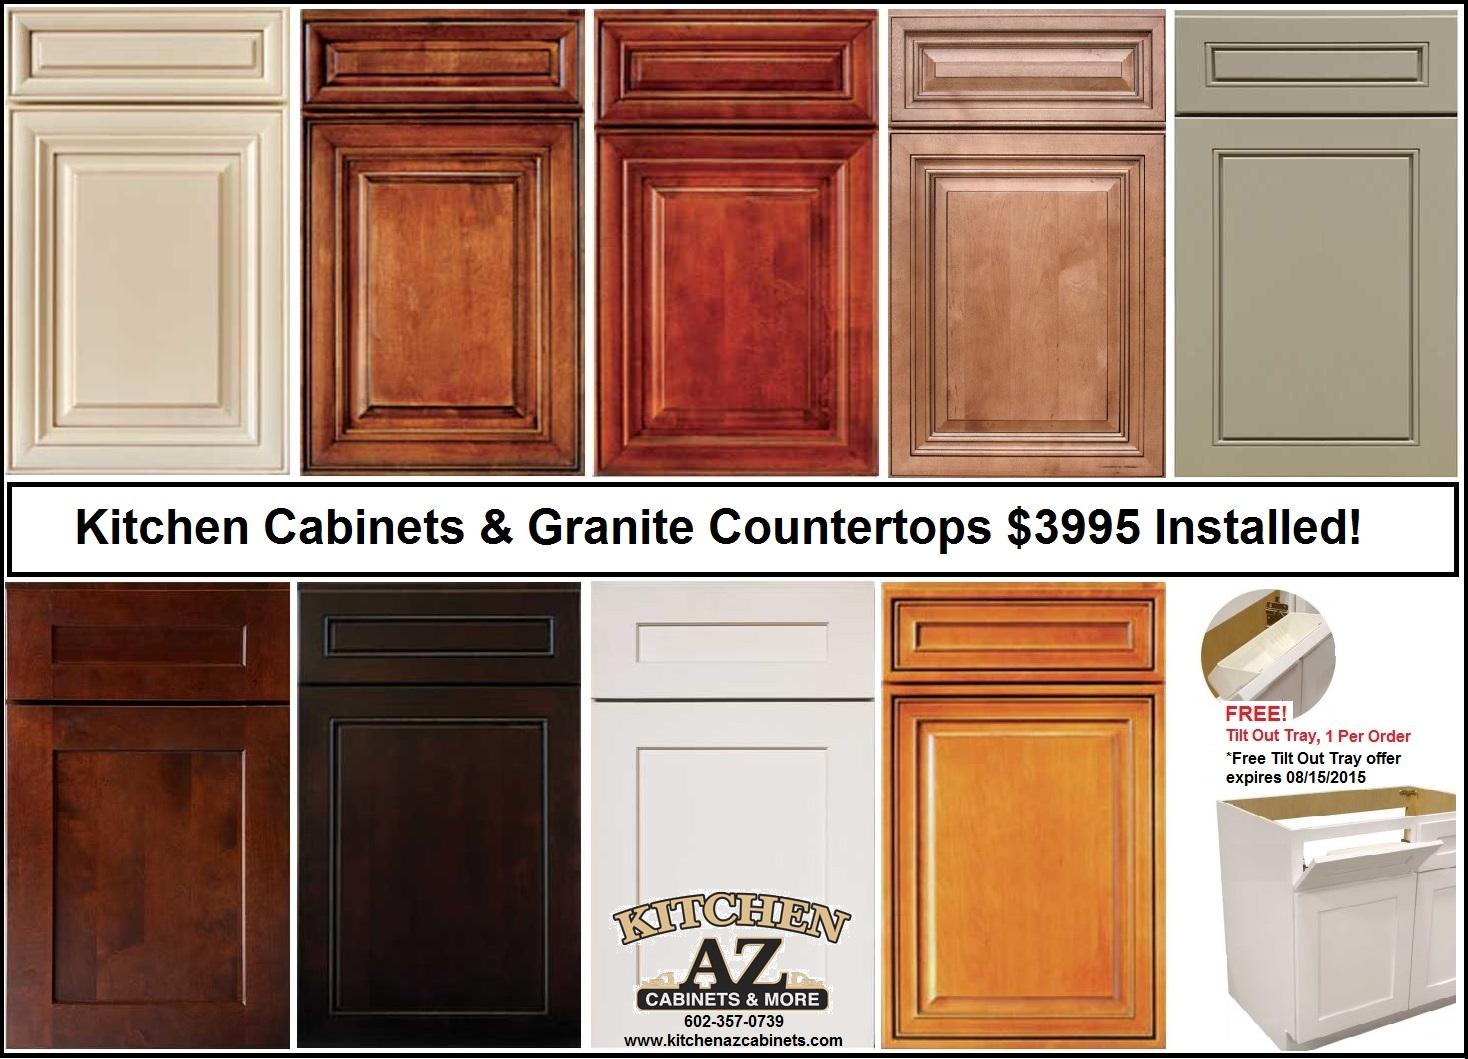 Glendale az kitchen cabinets granite countertops sale for New kitchen units for sale